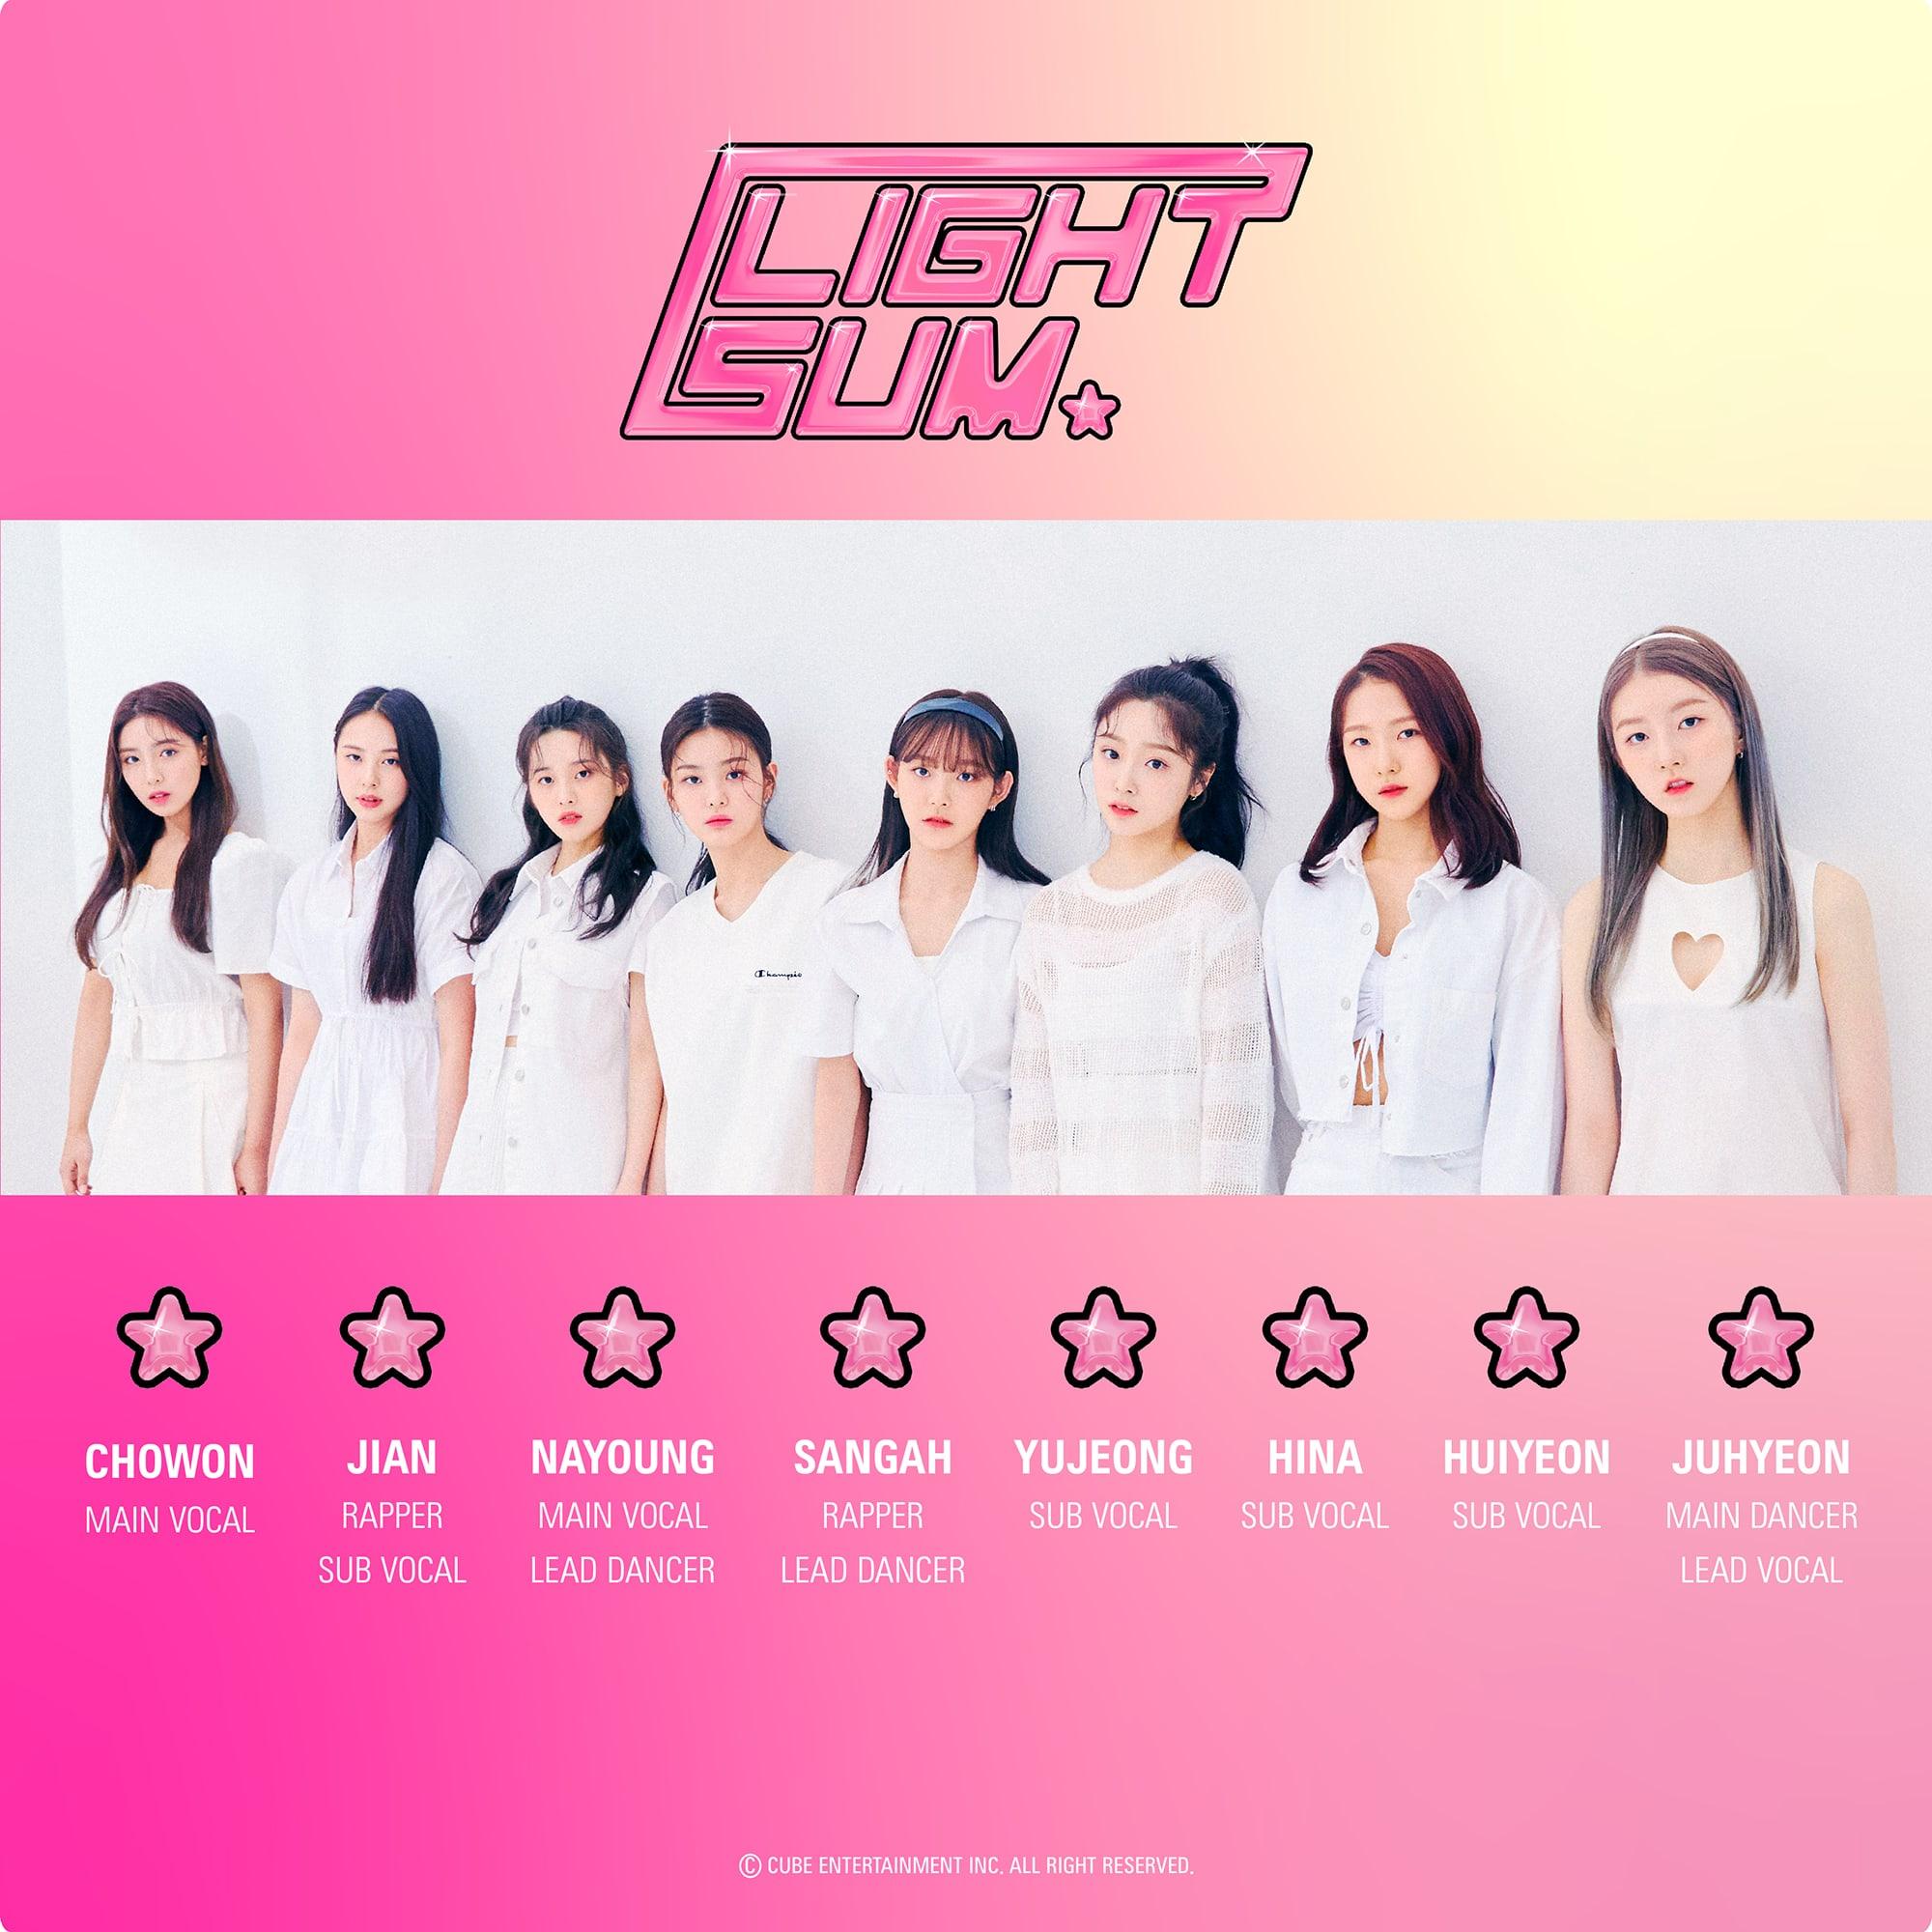 LIGHTSUM Positions